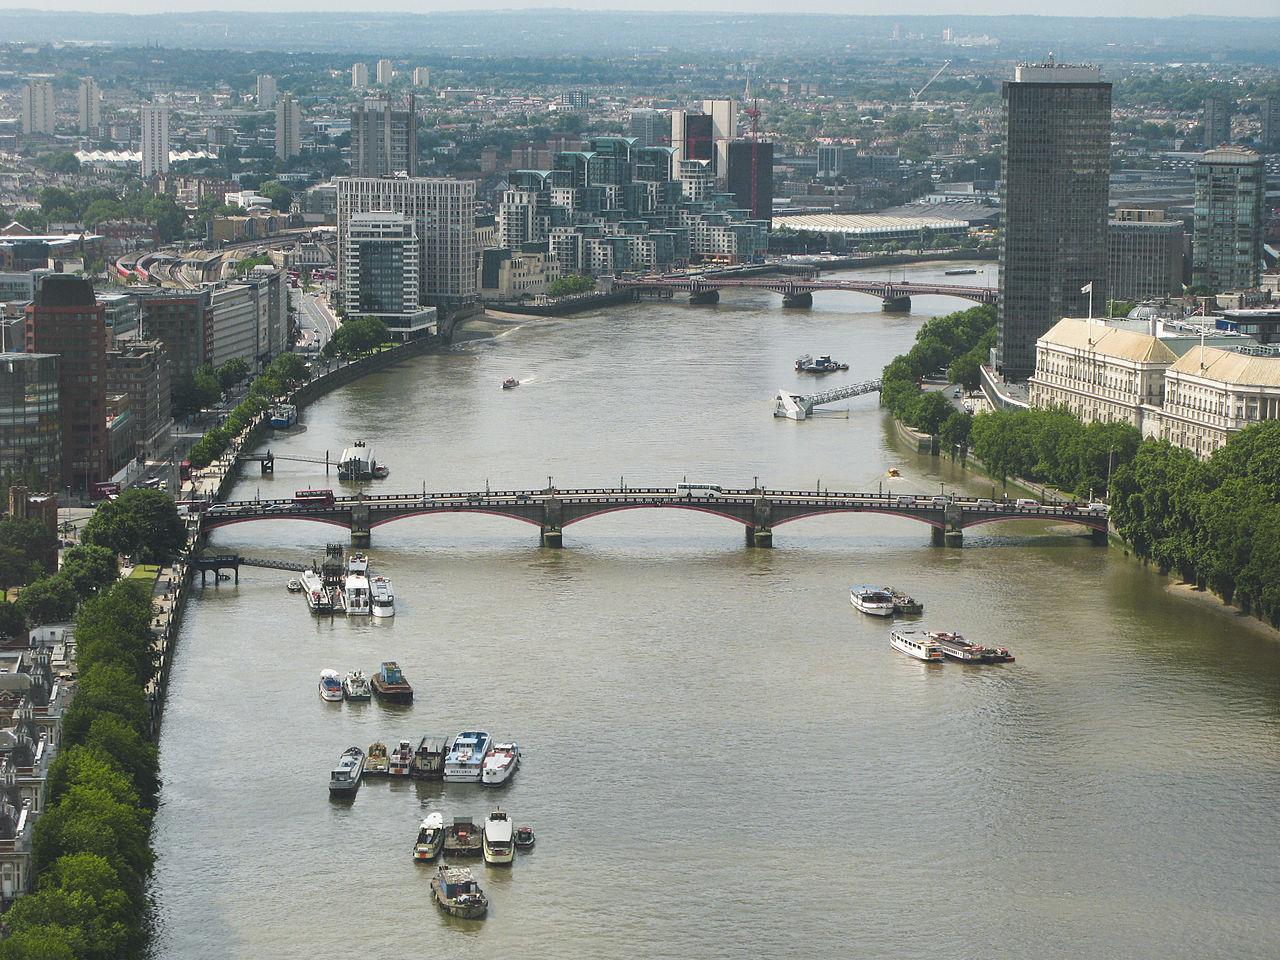 1280px-River_Thames_and_Lambeth_Bridge-7July2007